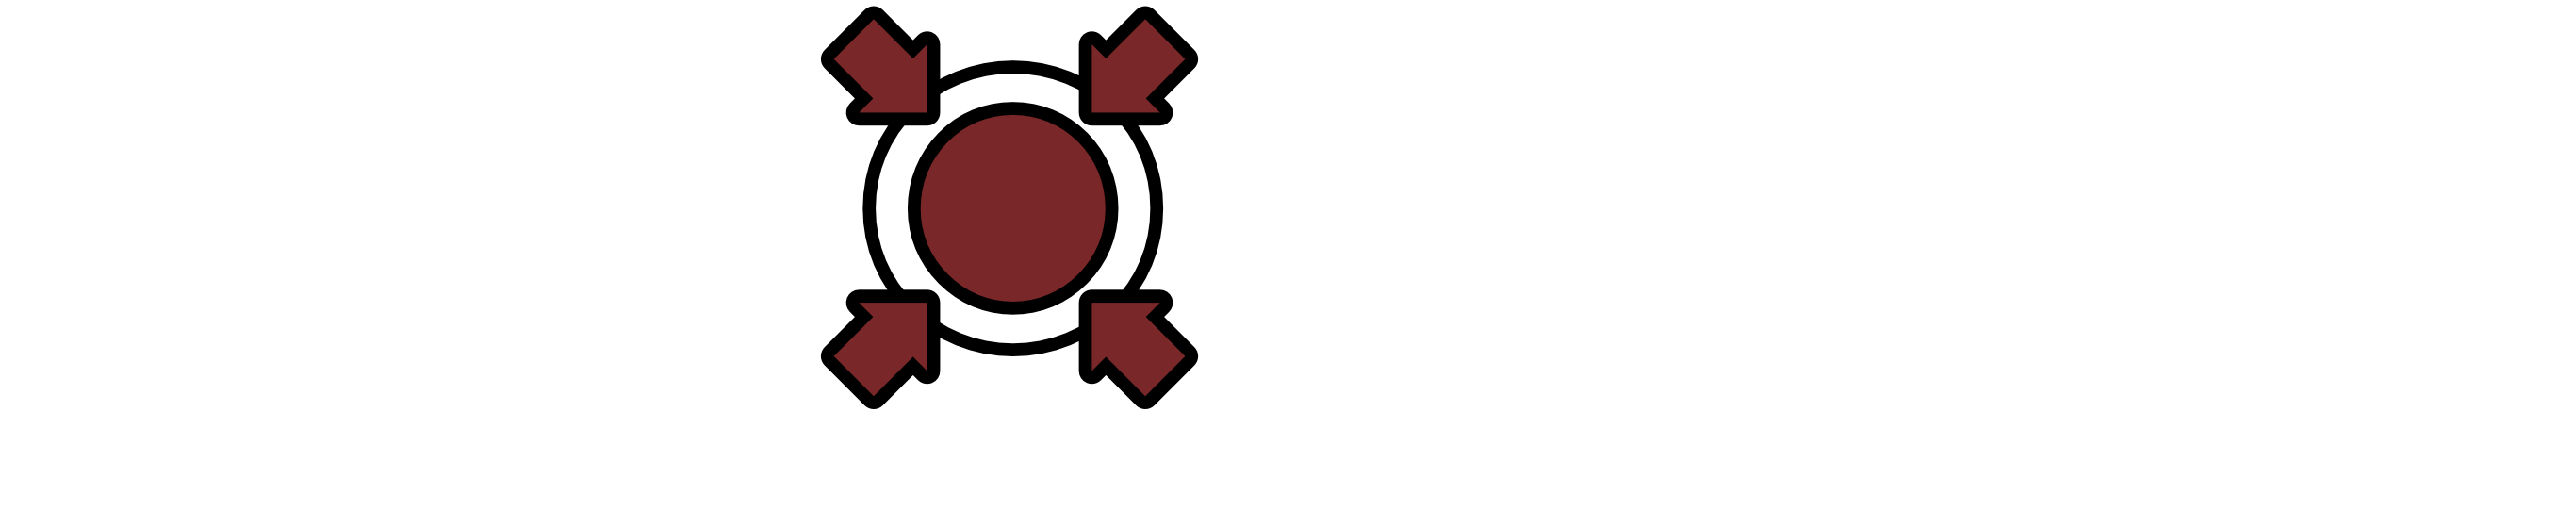 Logo punto dmc 2021